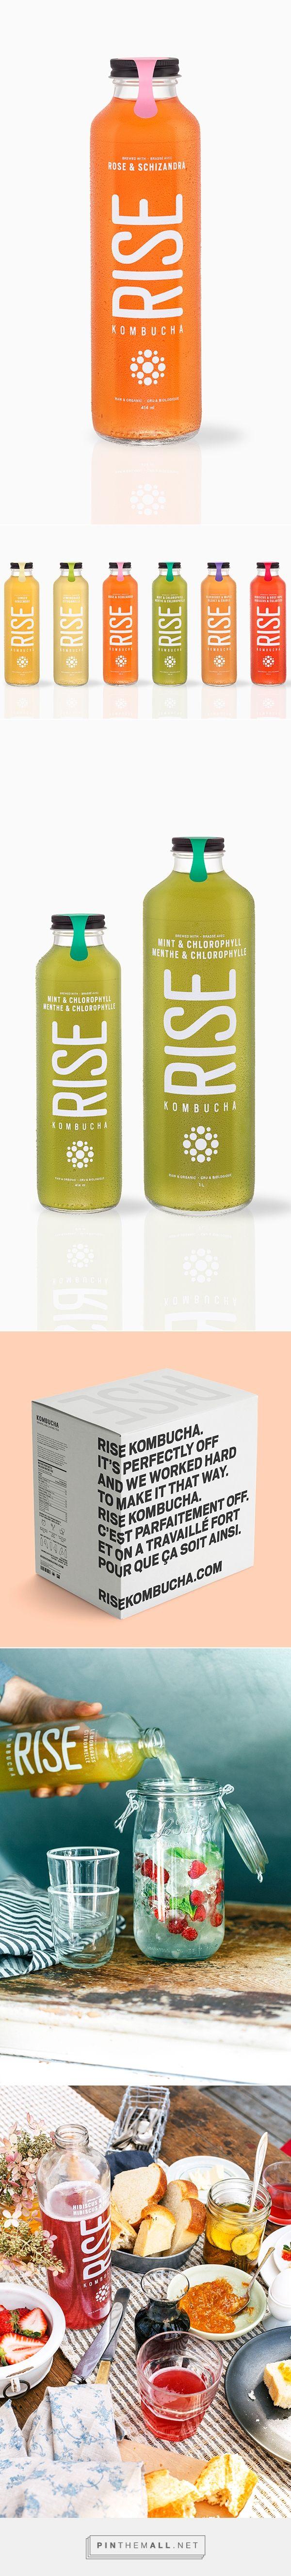 RISE Kombucha Packaging